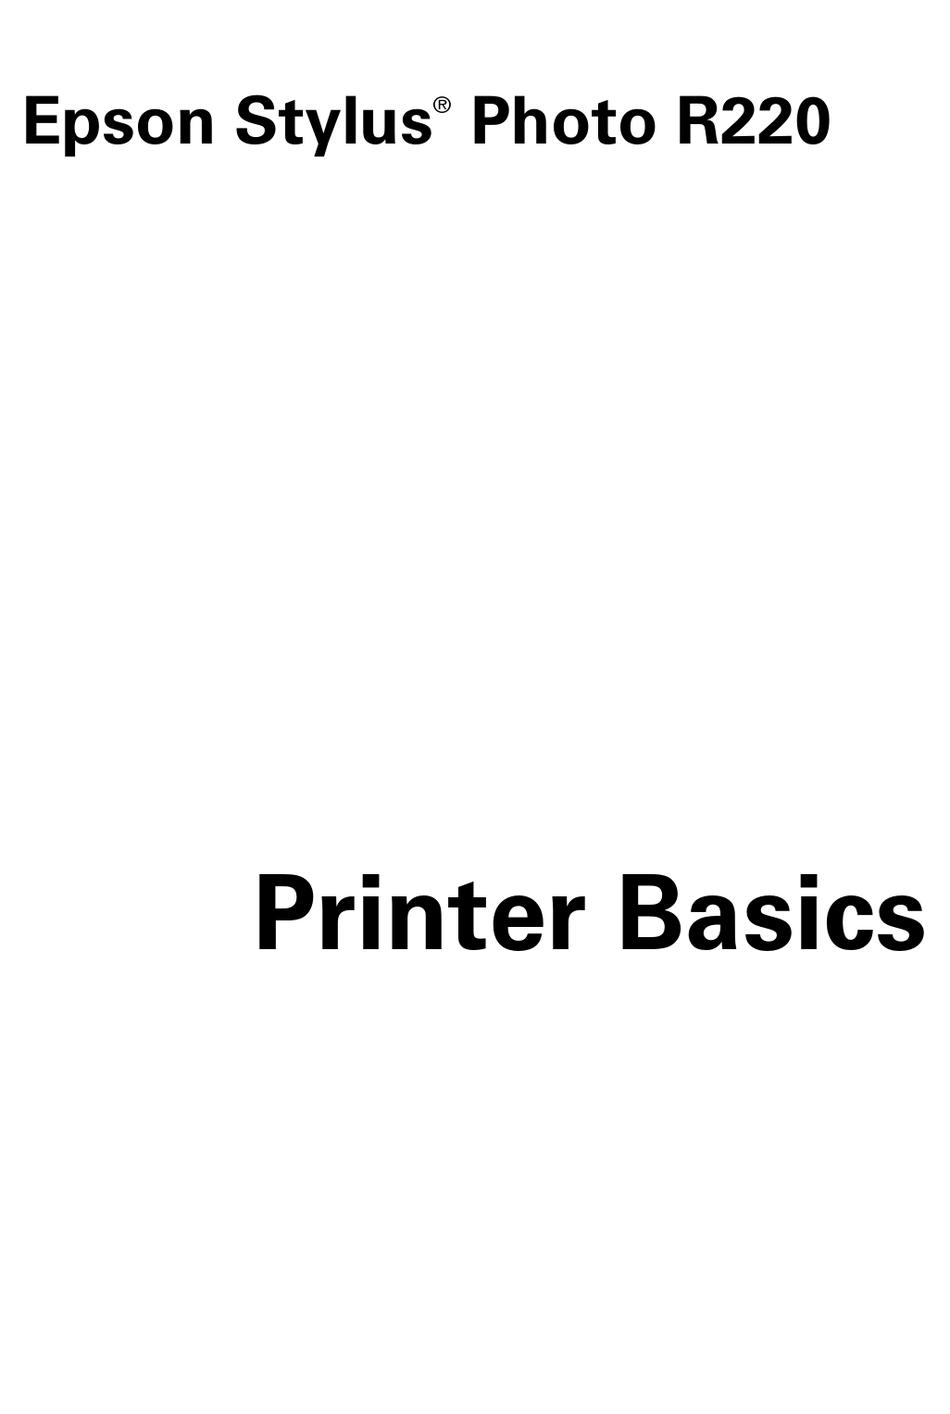 EPSON STYLUS PHOTO R220 PRINTER BASICS MANUAL Pdf Download